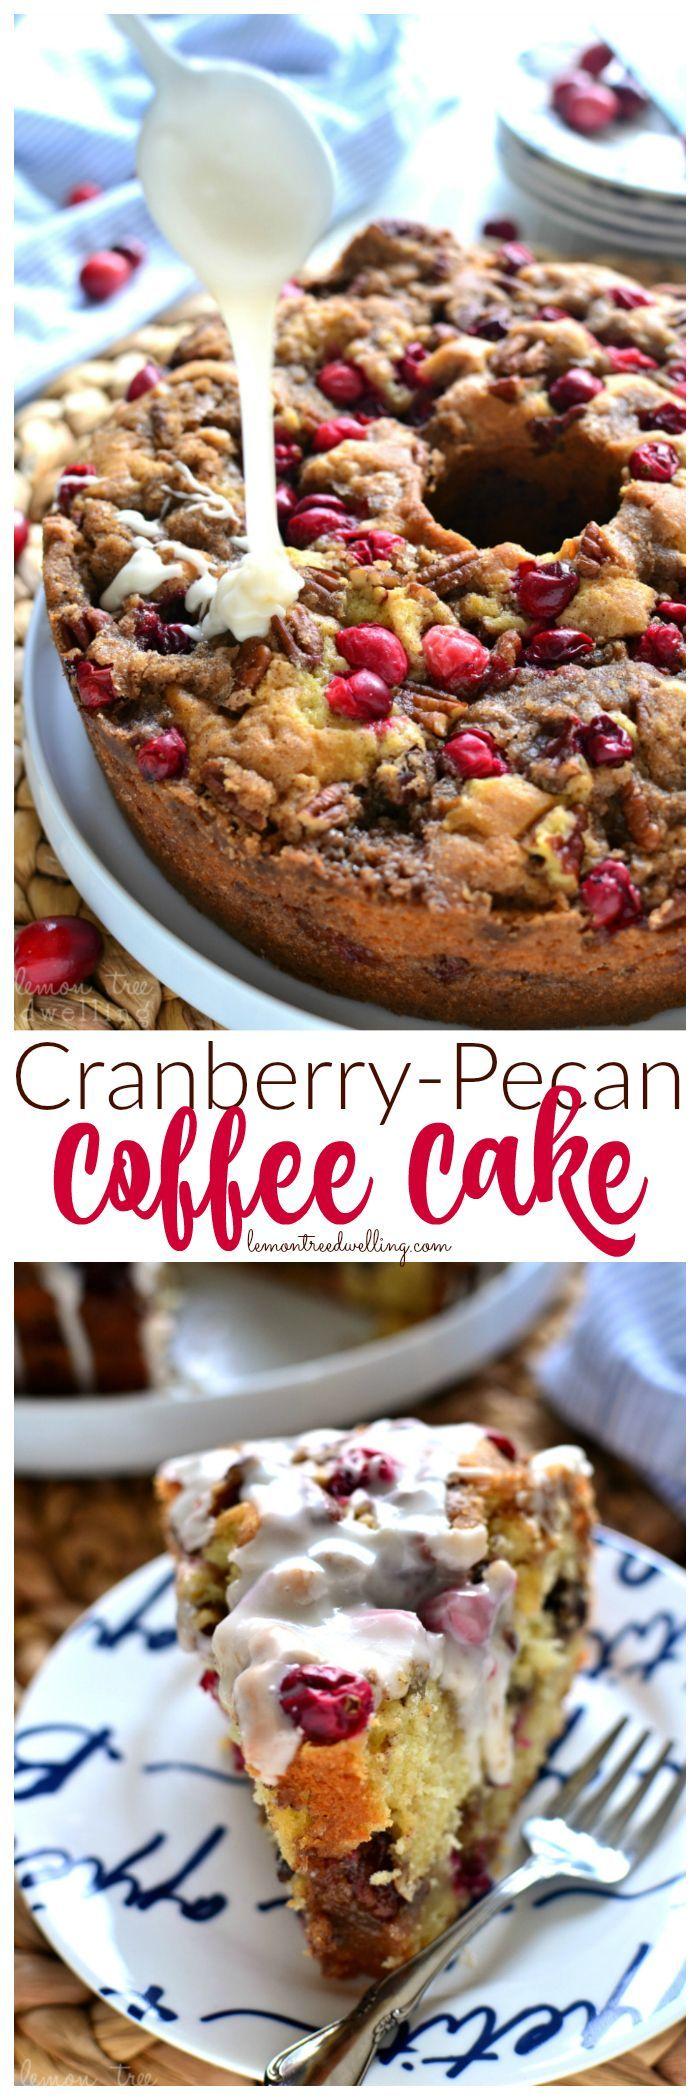 110 best Cranberry Recipes images on Pinterest